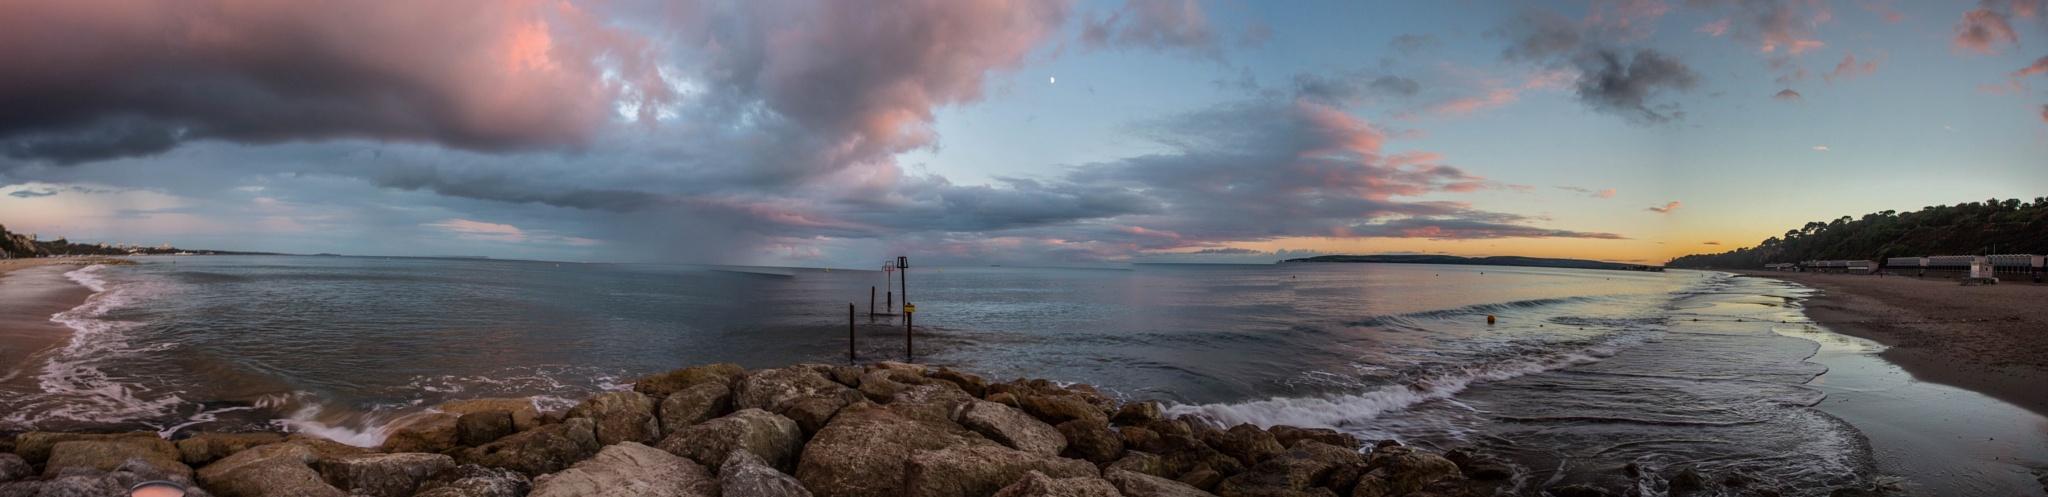 Bournemouth sunset by kim.finlay.14